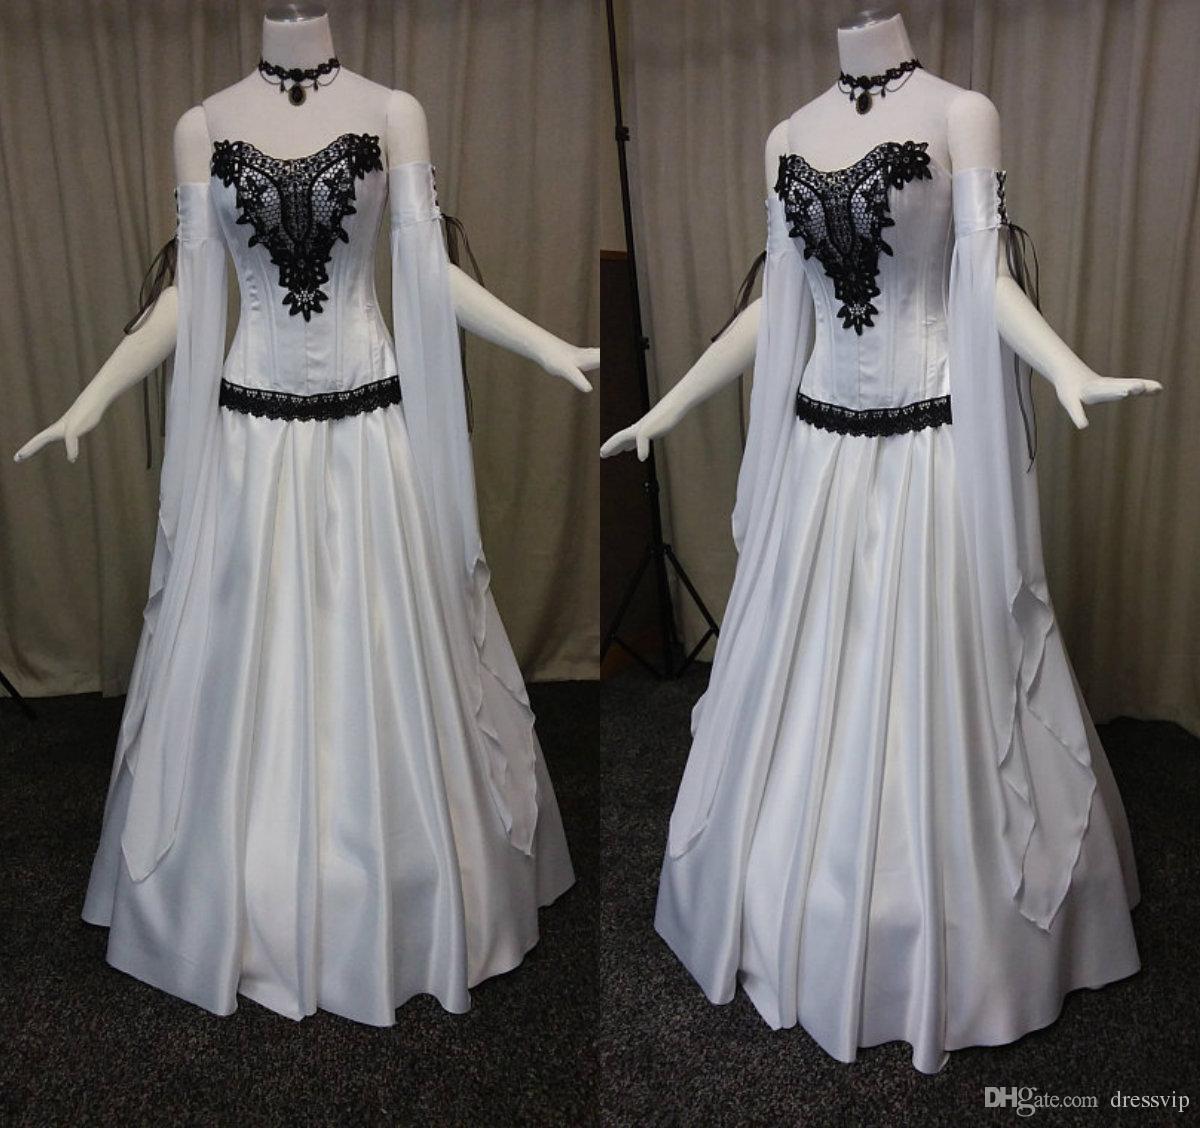 2018 Robes De Mariée Gothique Blanc Sweetheart Dentelle Appliques Vampire Ball Masquerade Costume Halloween Long Sleeev Robe De Mariée Robes De Mariée